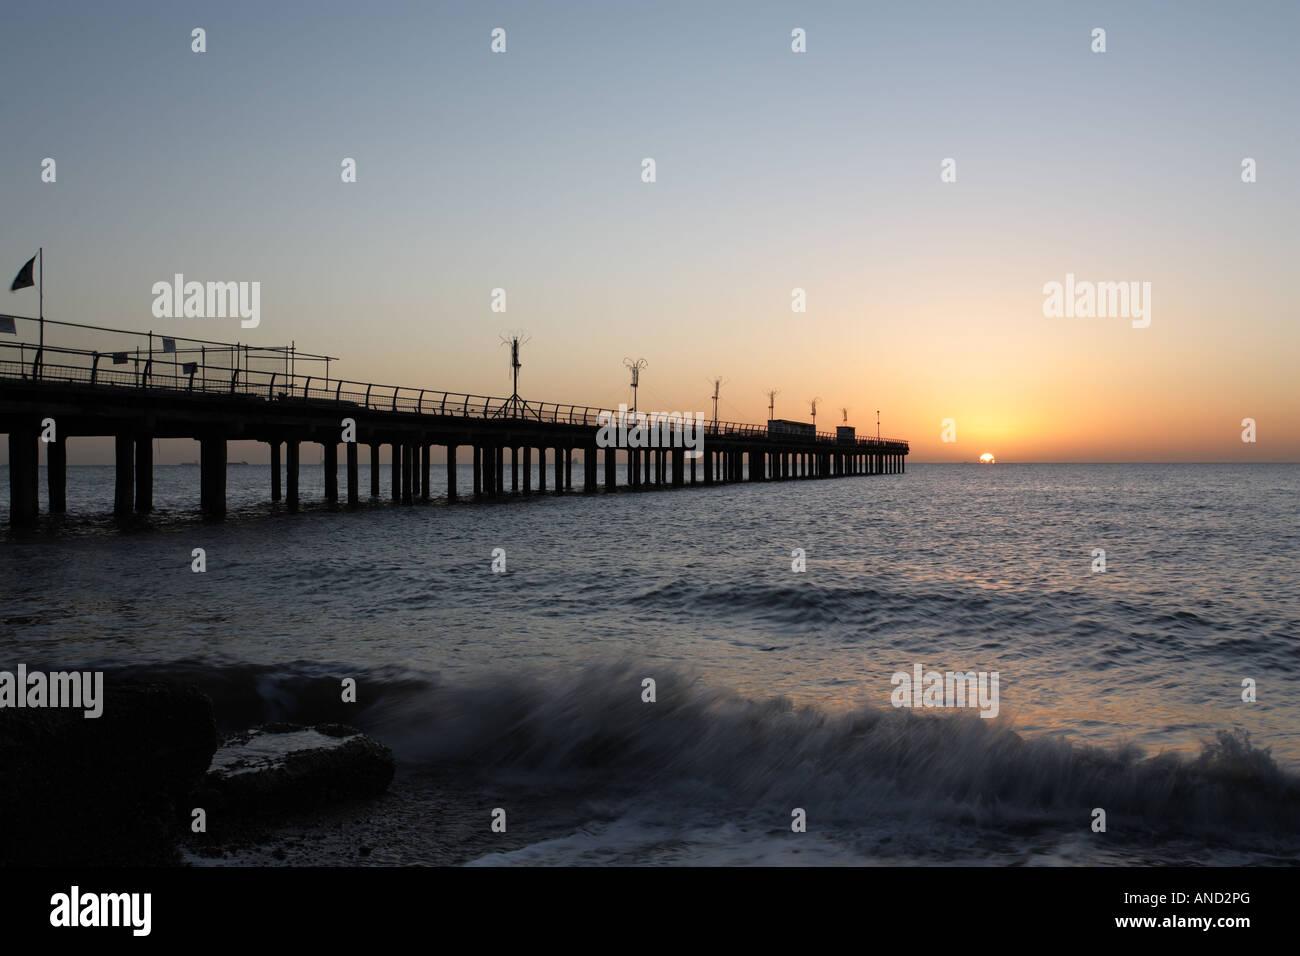 The Pier at Felixstowe. - Stock Image